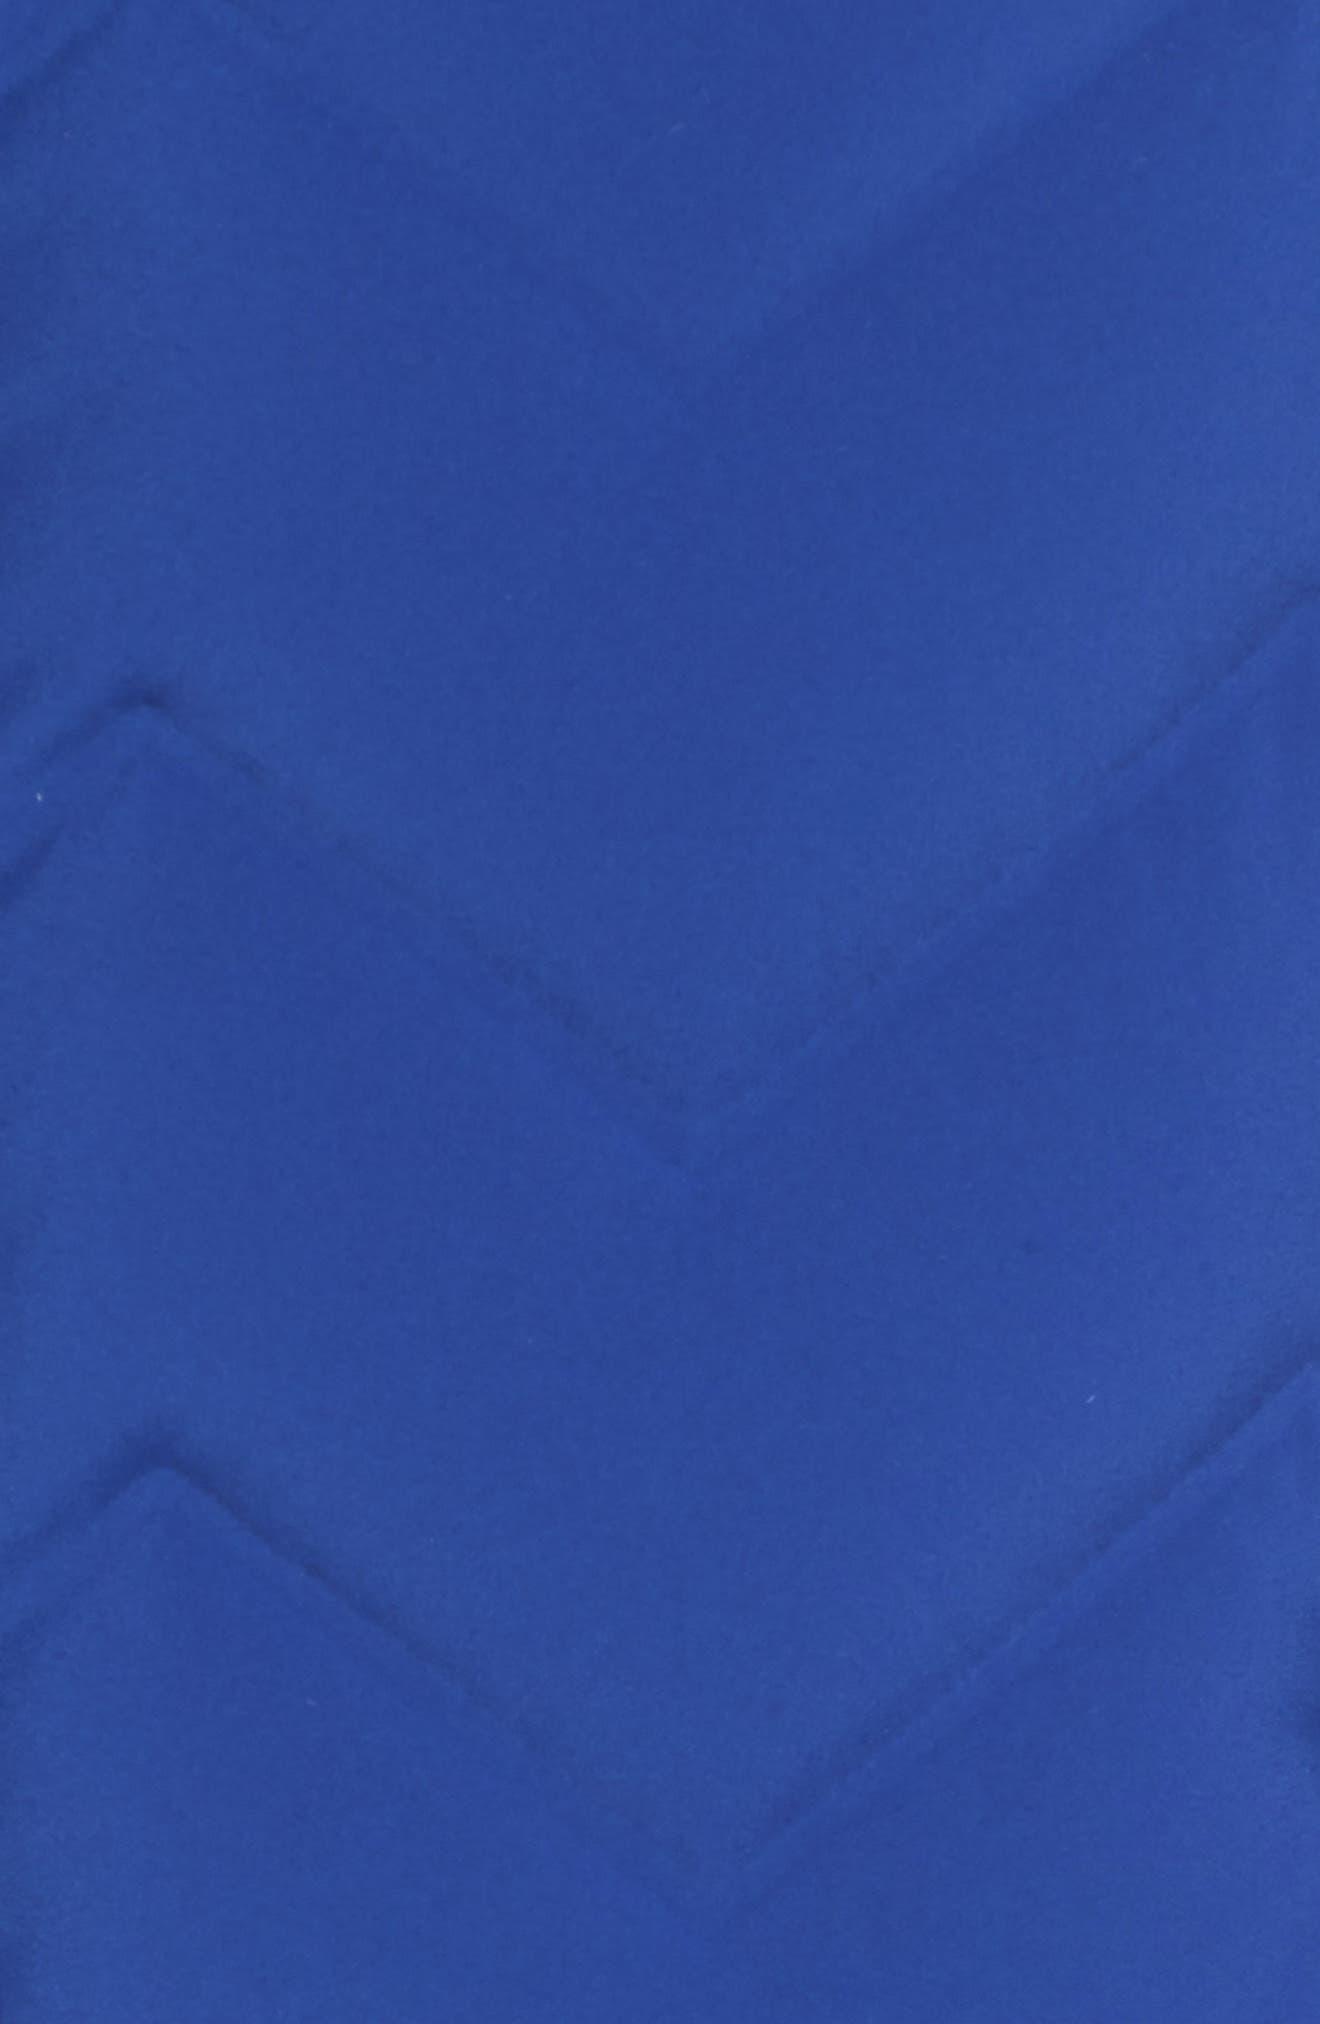 Hobart Down Vest,                             Alternate thumbnail 6, color,                             BRIGHT BLUE